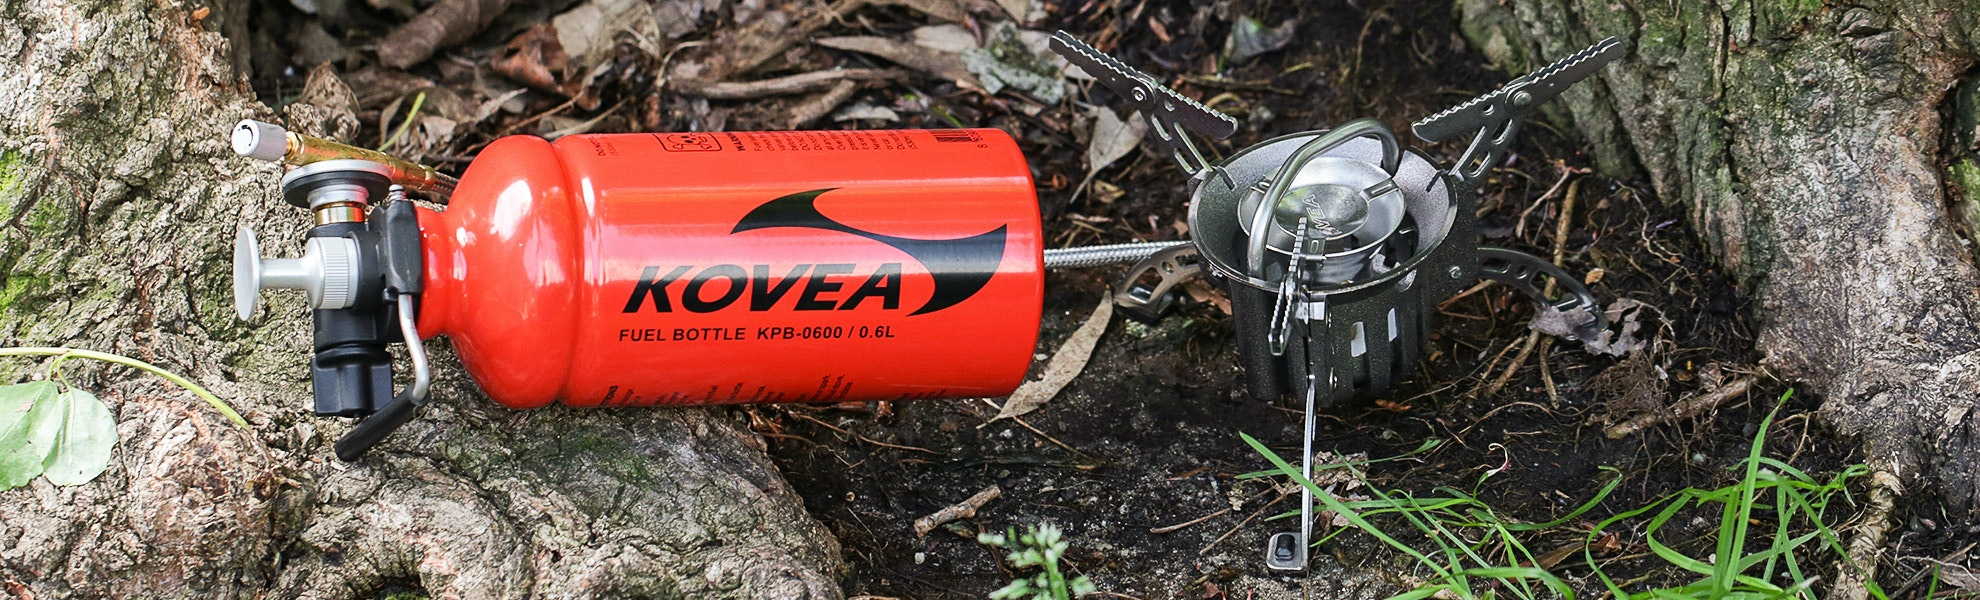 Kovea Booster+1 MultiFuel Stove